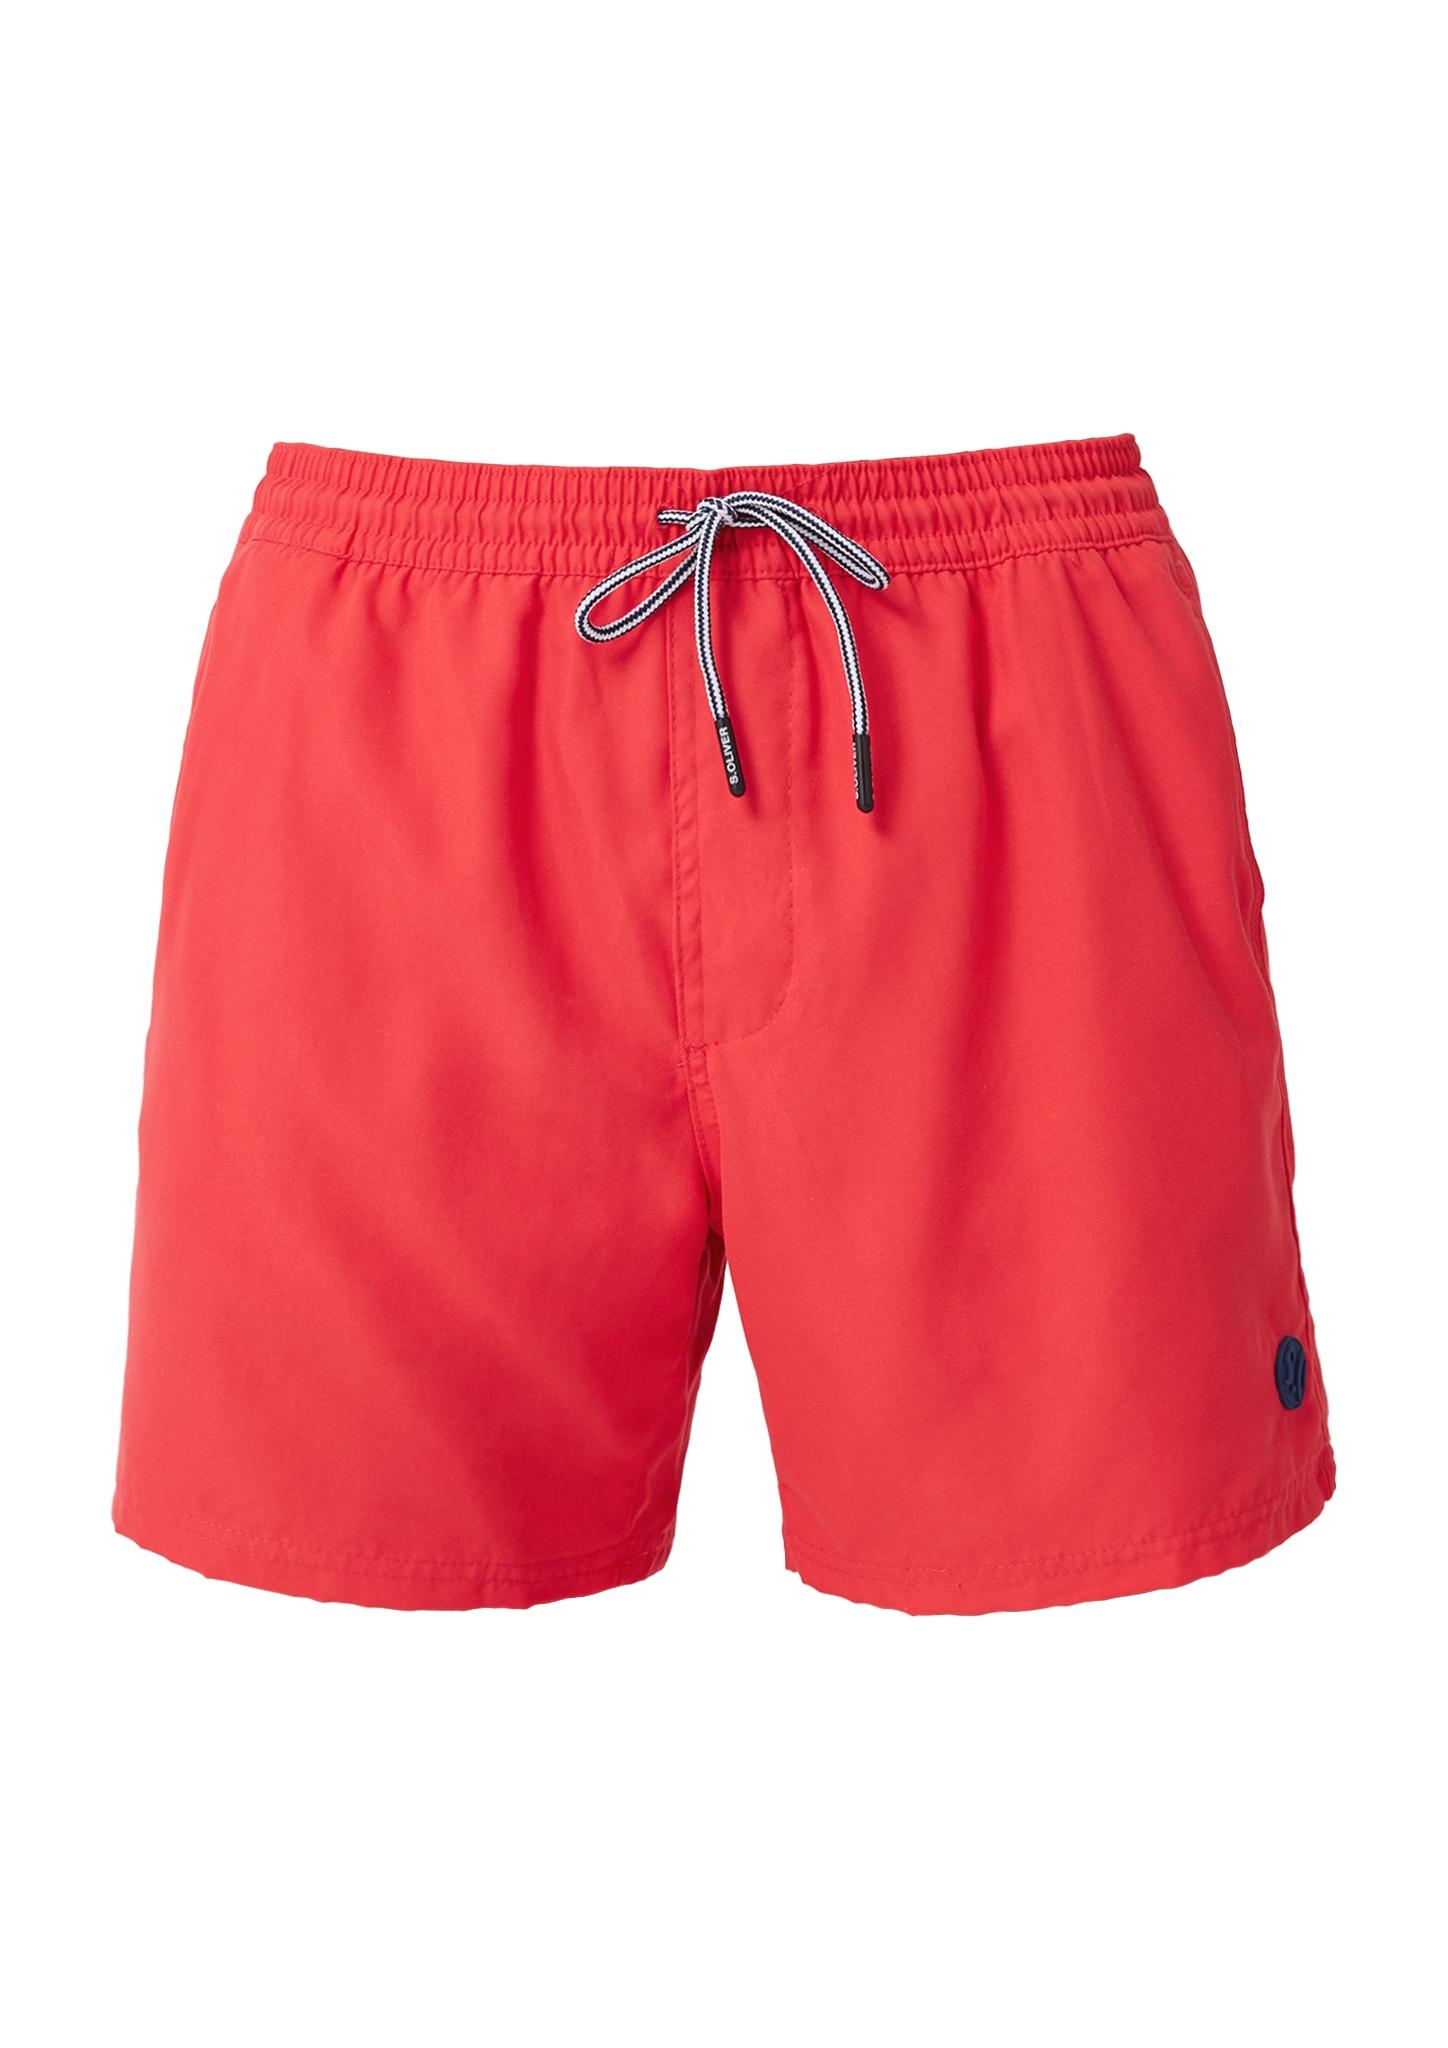 Badeshorts | Bekleidung > Bademode | Rot | Oberstoff: 100% polyester| futter: 100% polyester | s.Oliver